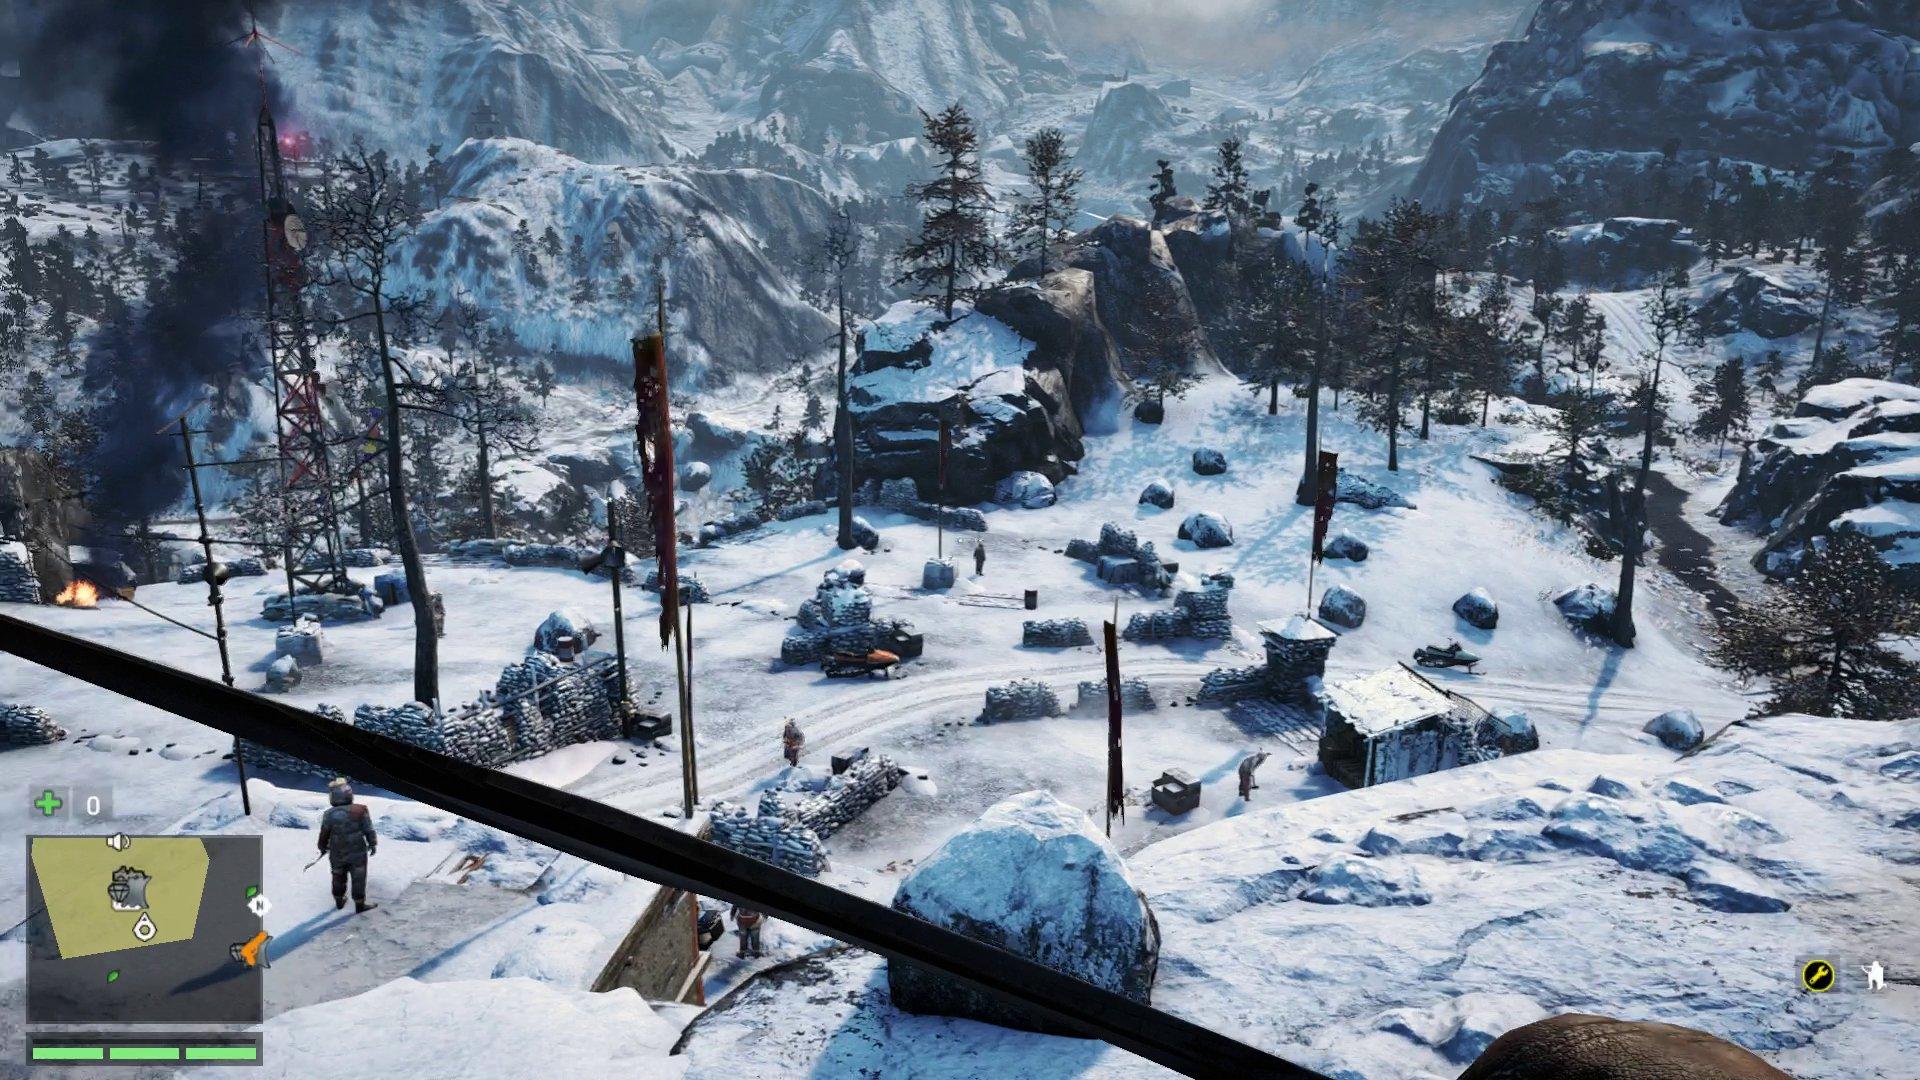 Far Cry 4 - Valle de los Yetis - PC (X360 XOne PS3 PS4)